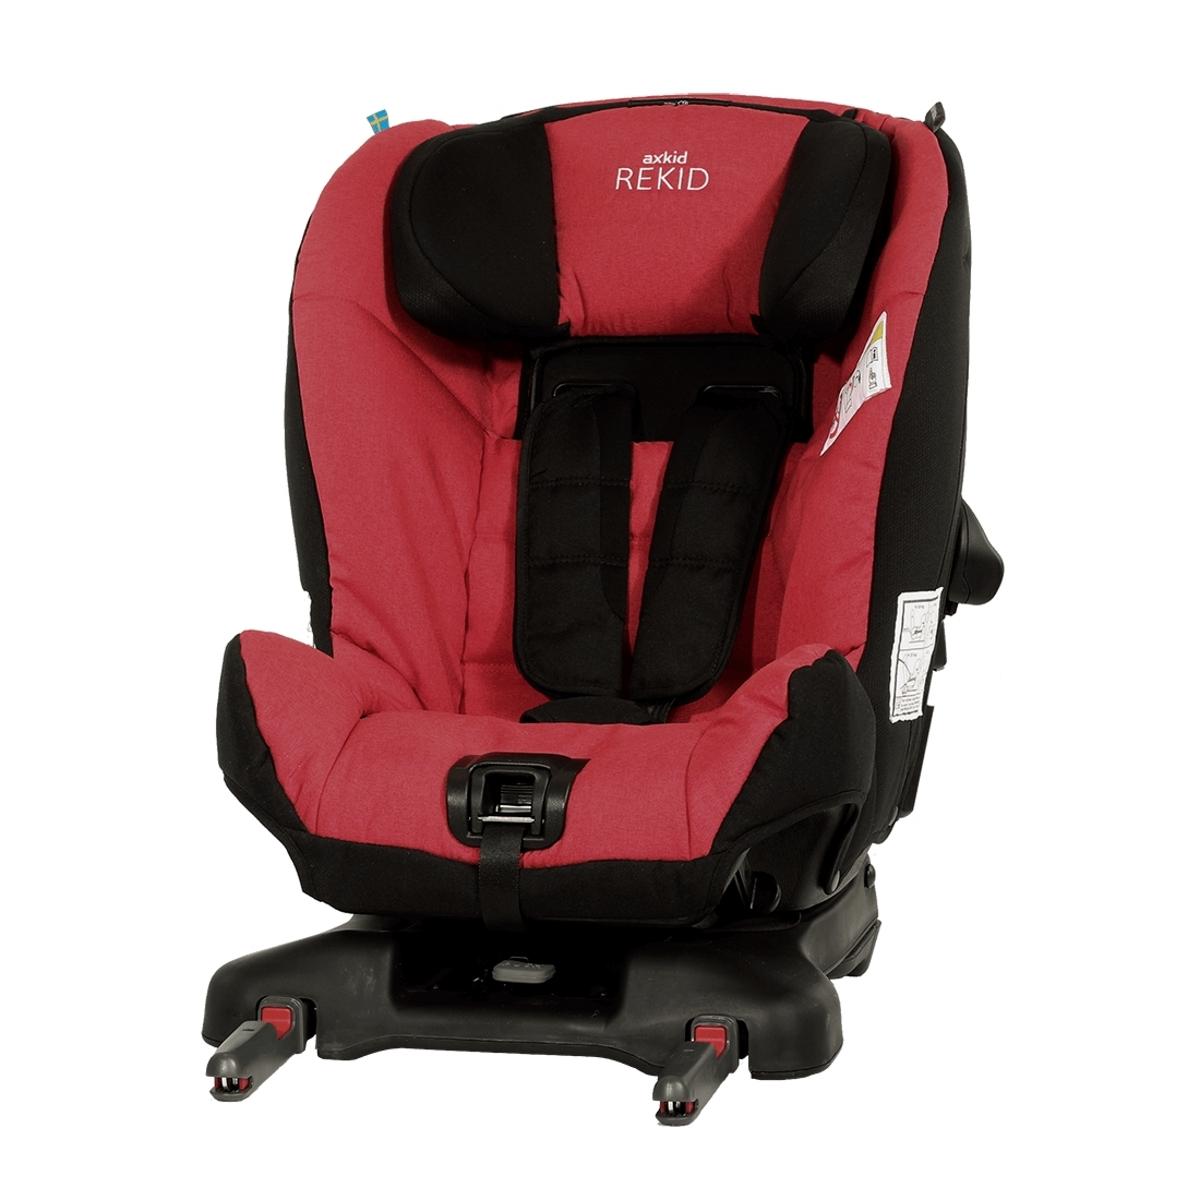 Cadeira auto Axkid Rekid Car Seat